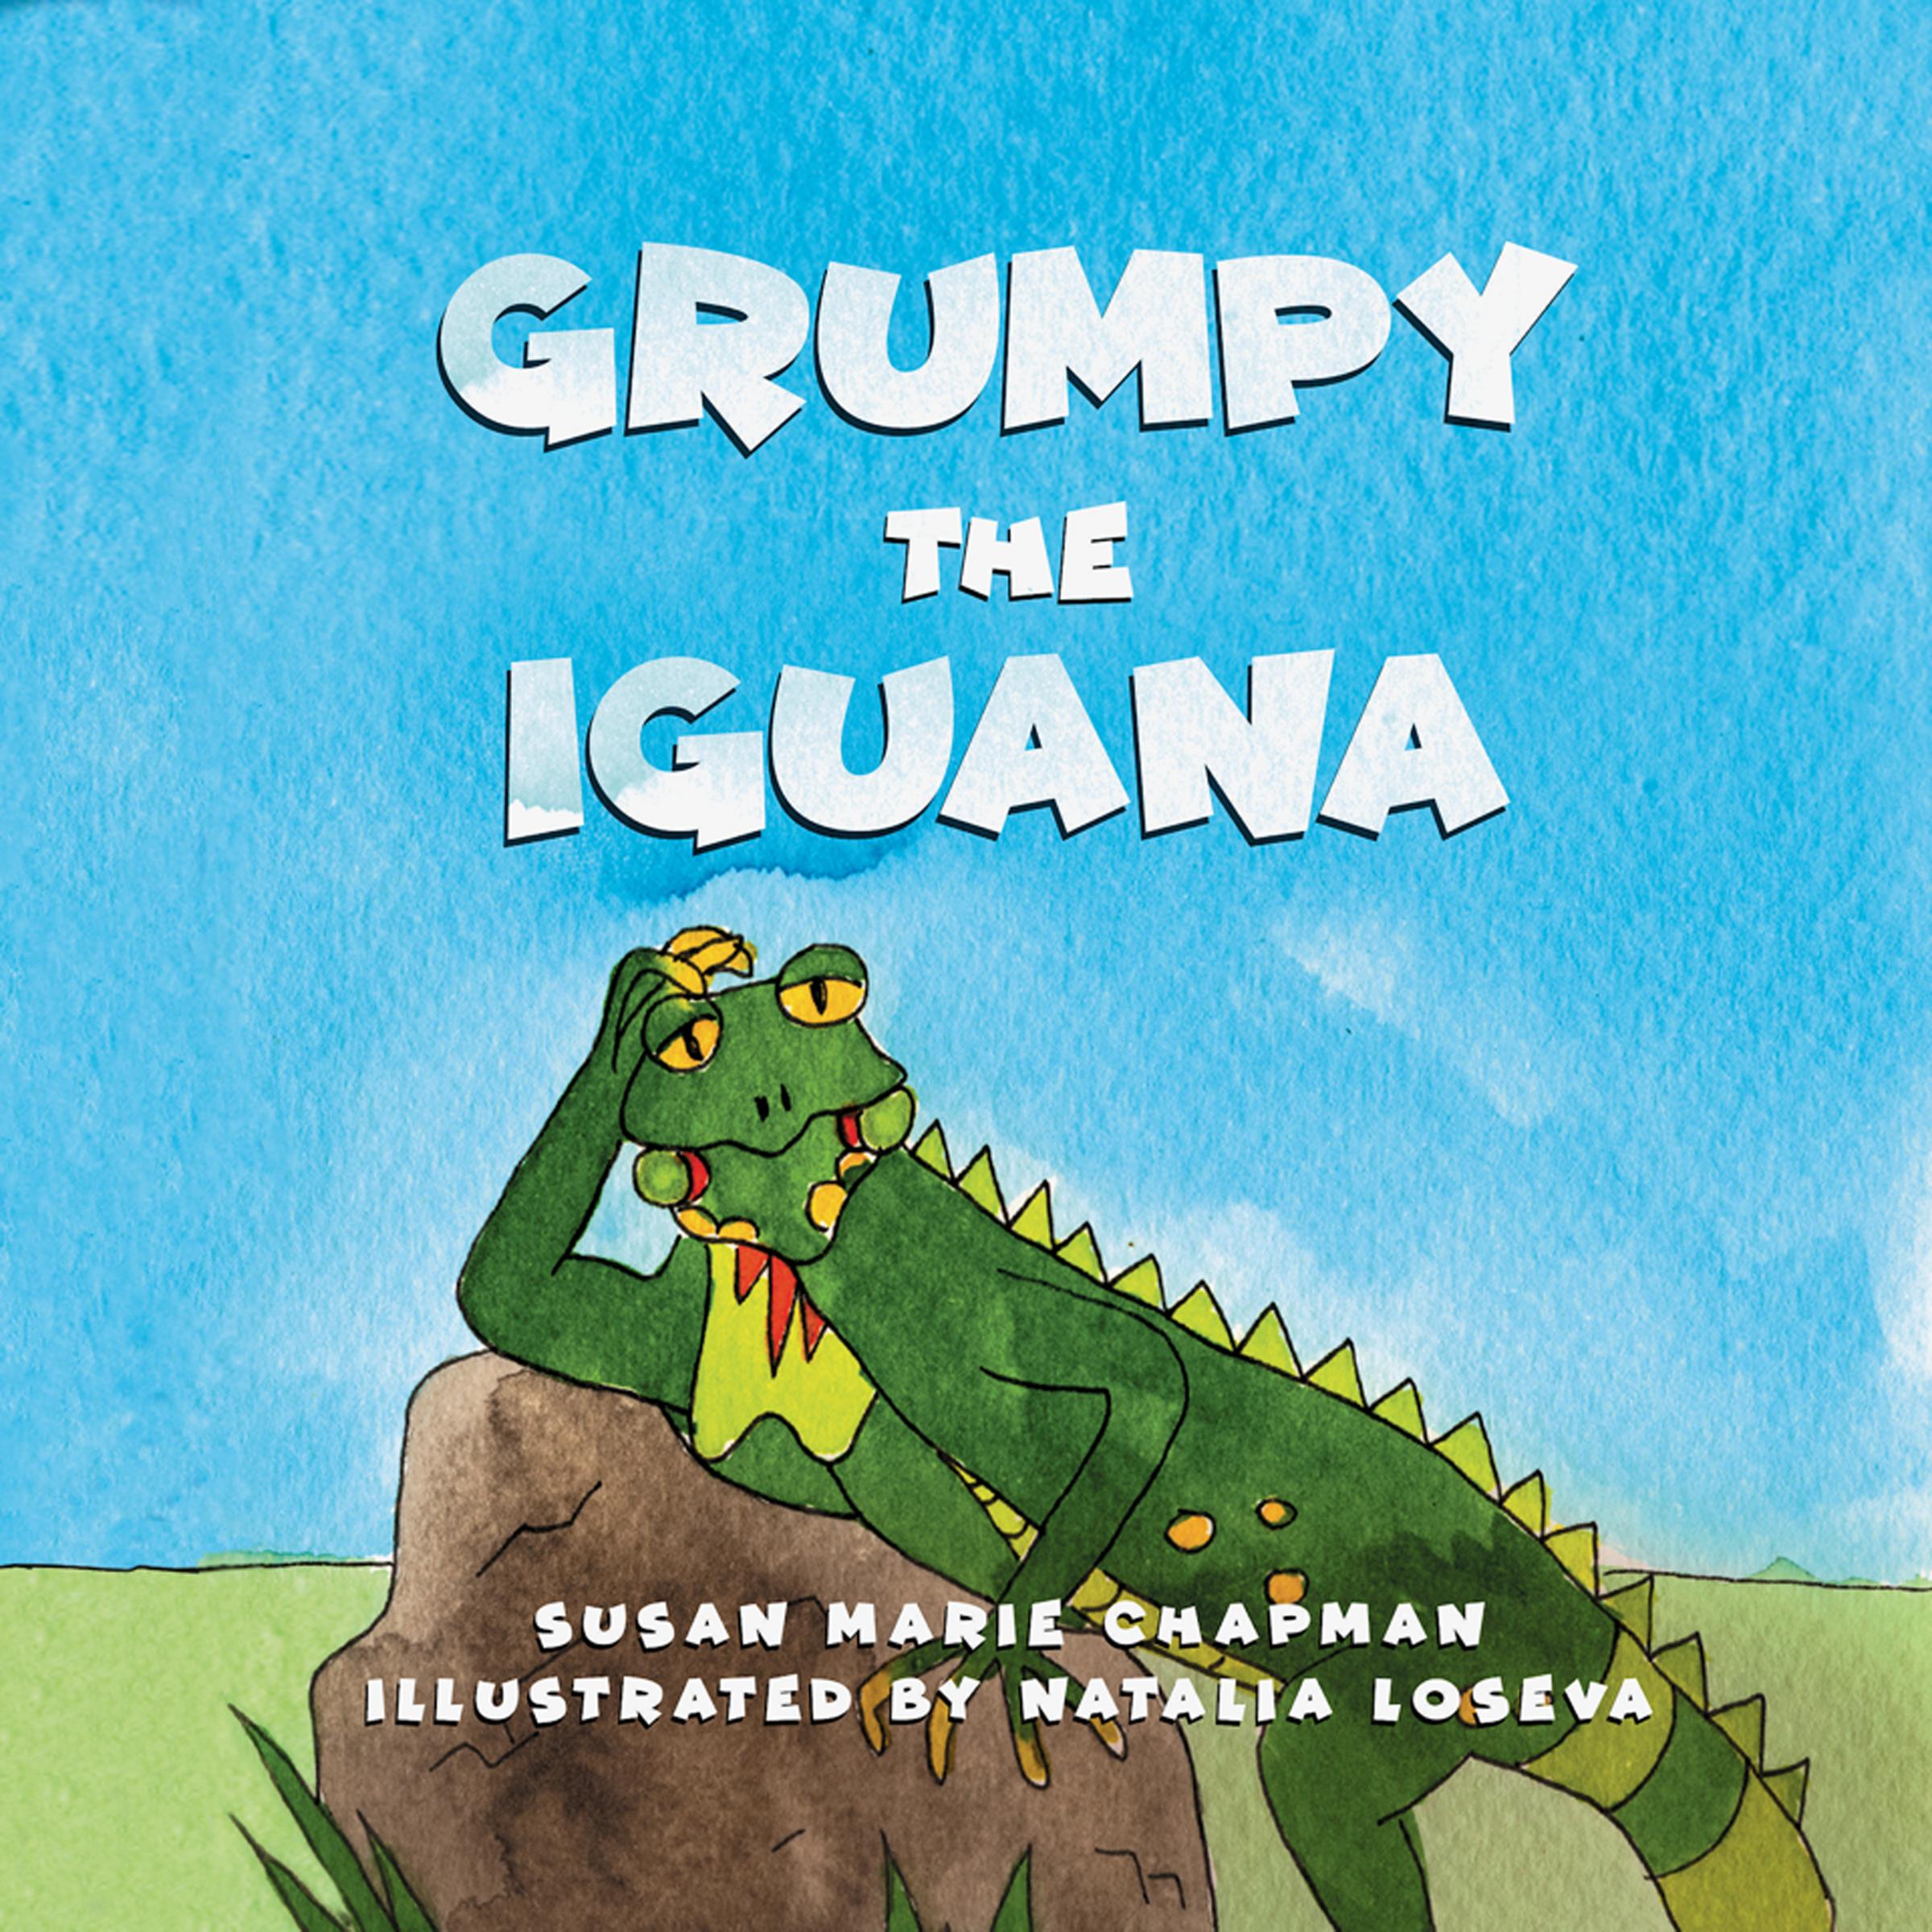 Grumpy the Iguana